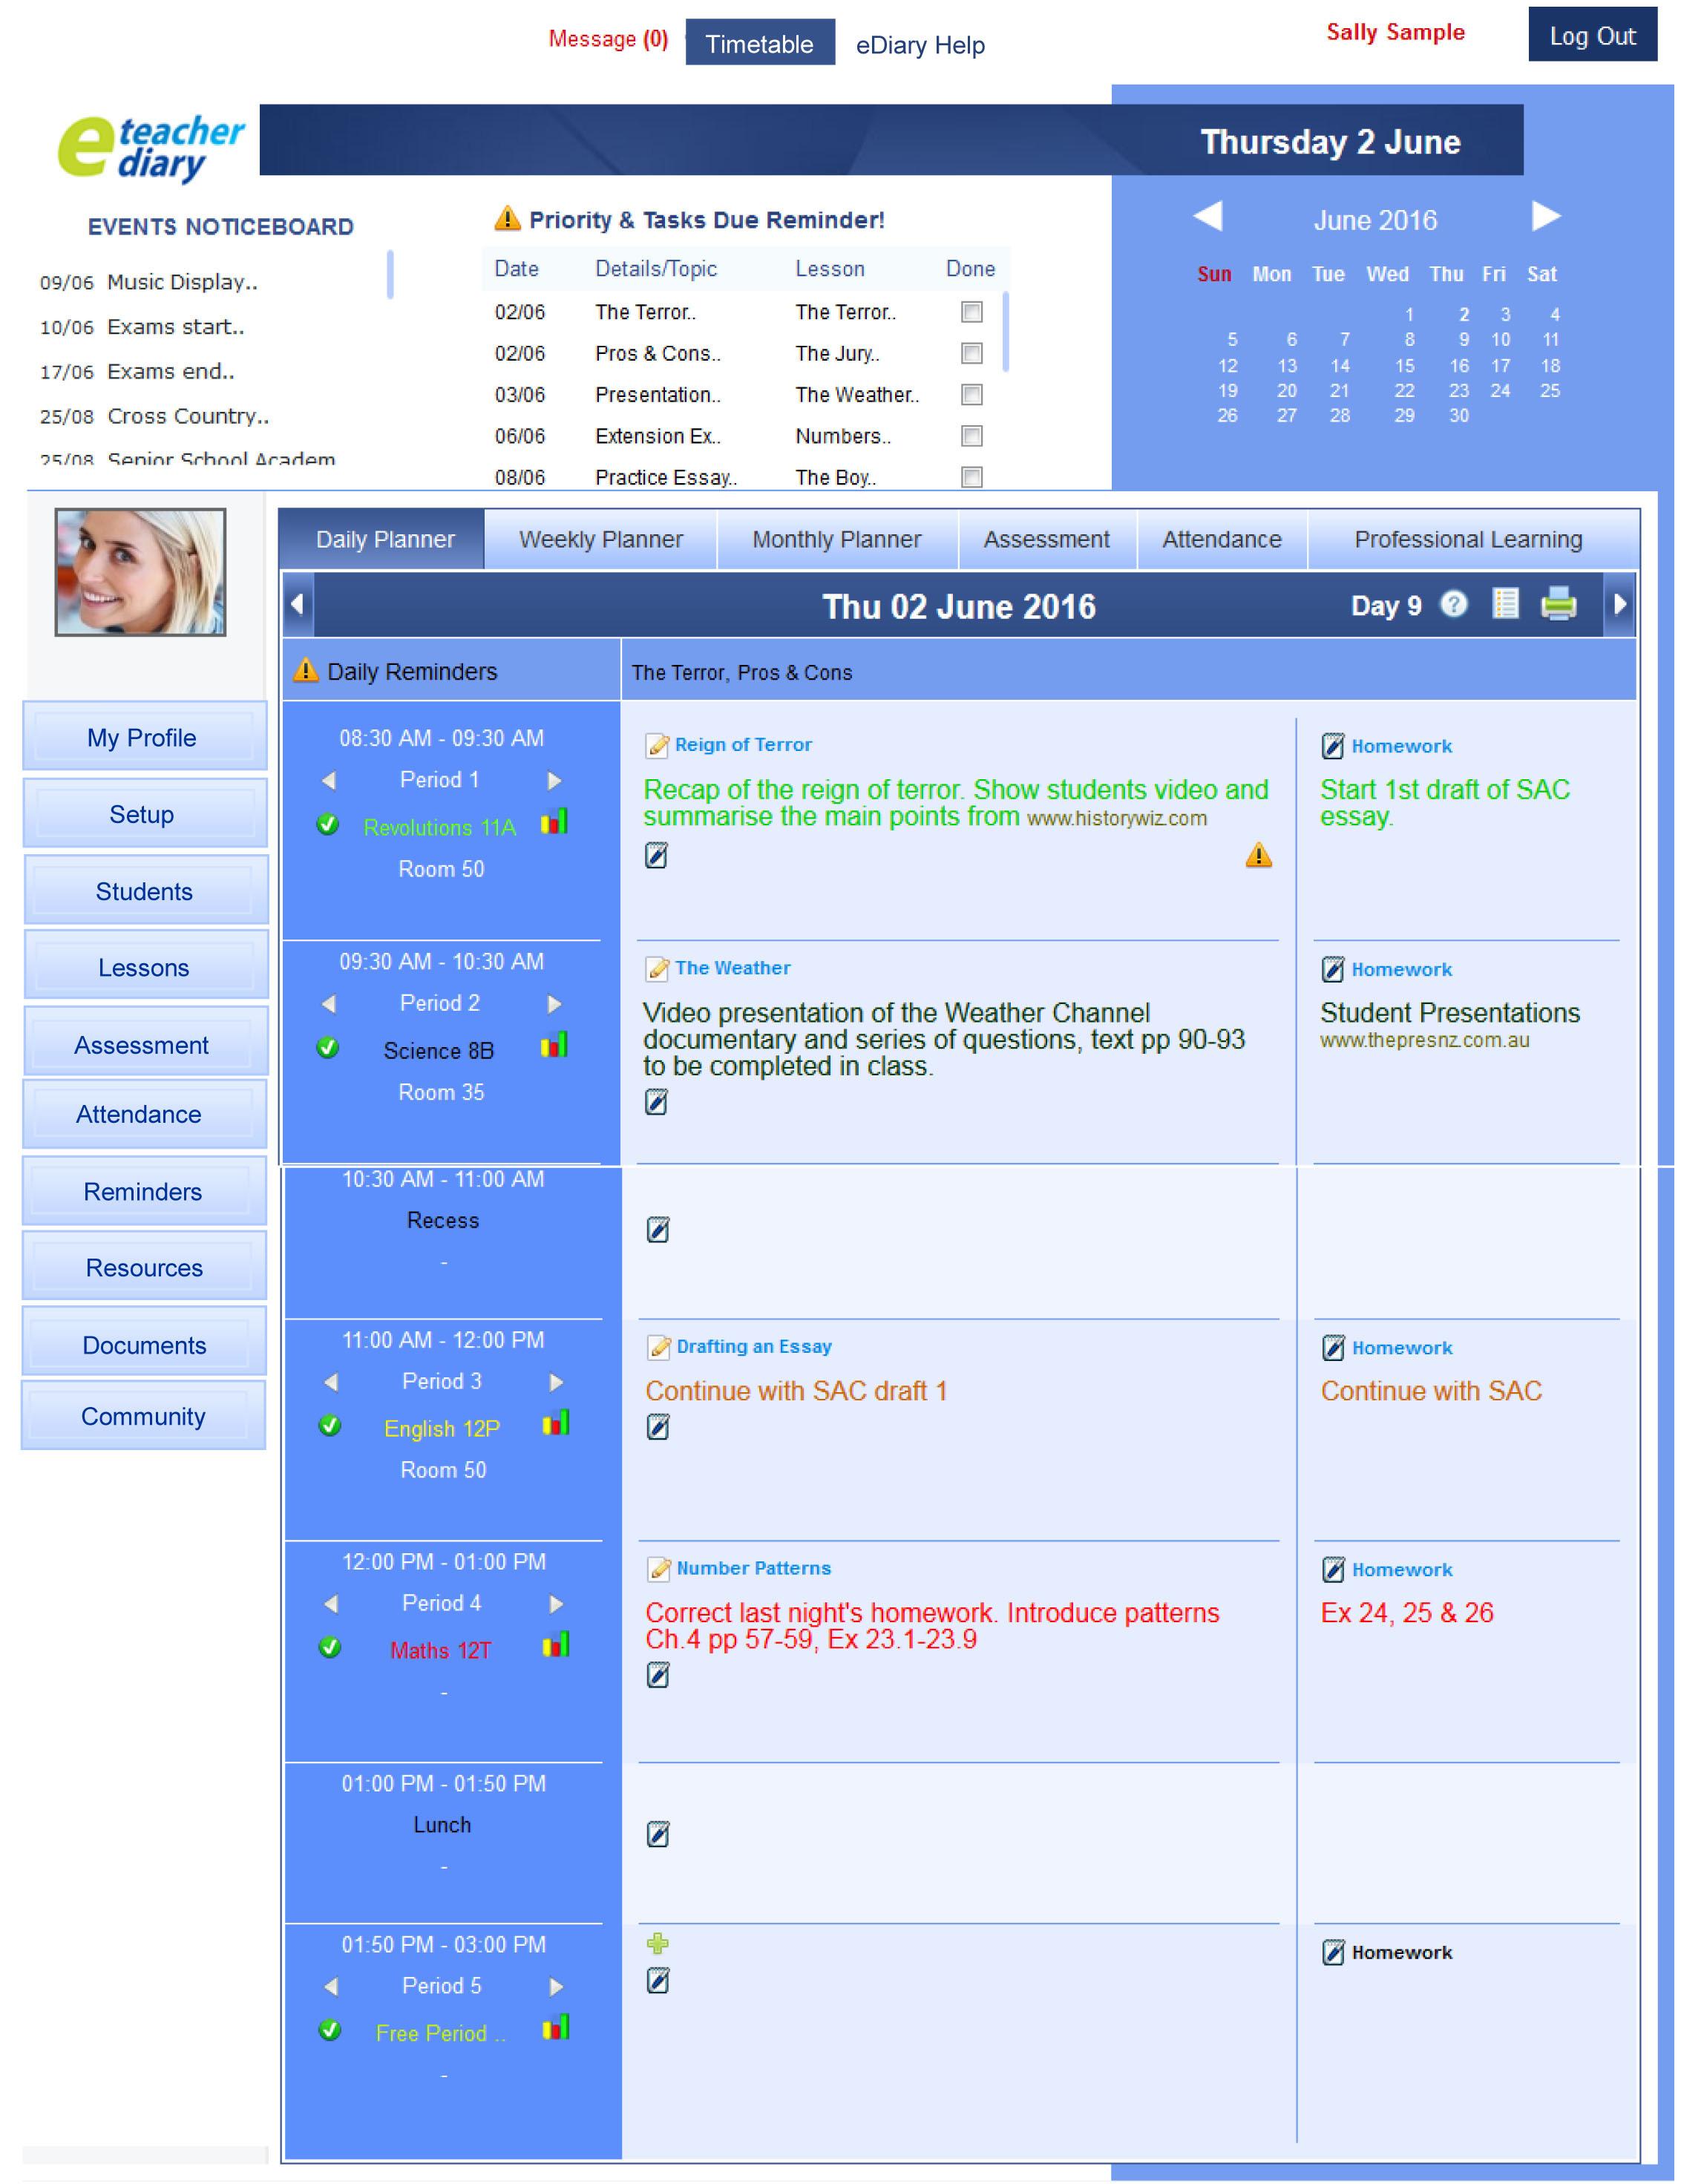 eDiary Weekly Planner View